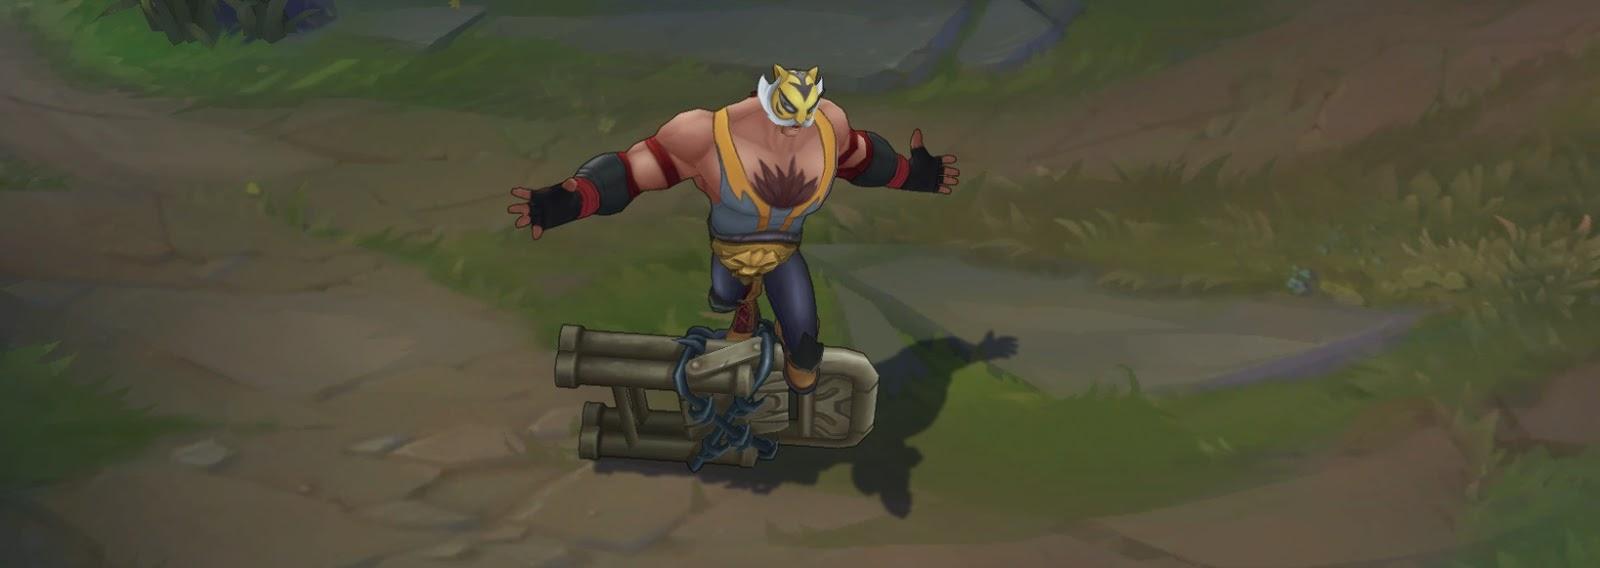 El Tigre Braum-1